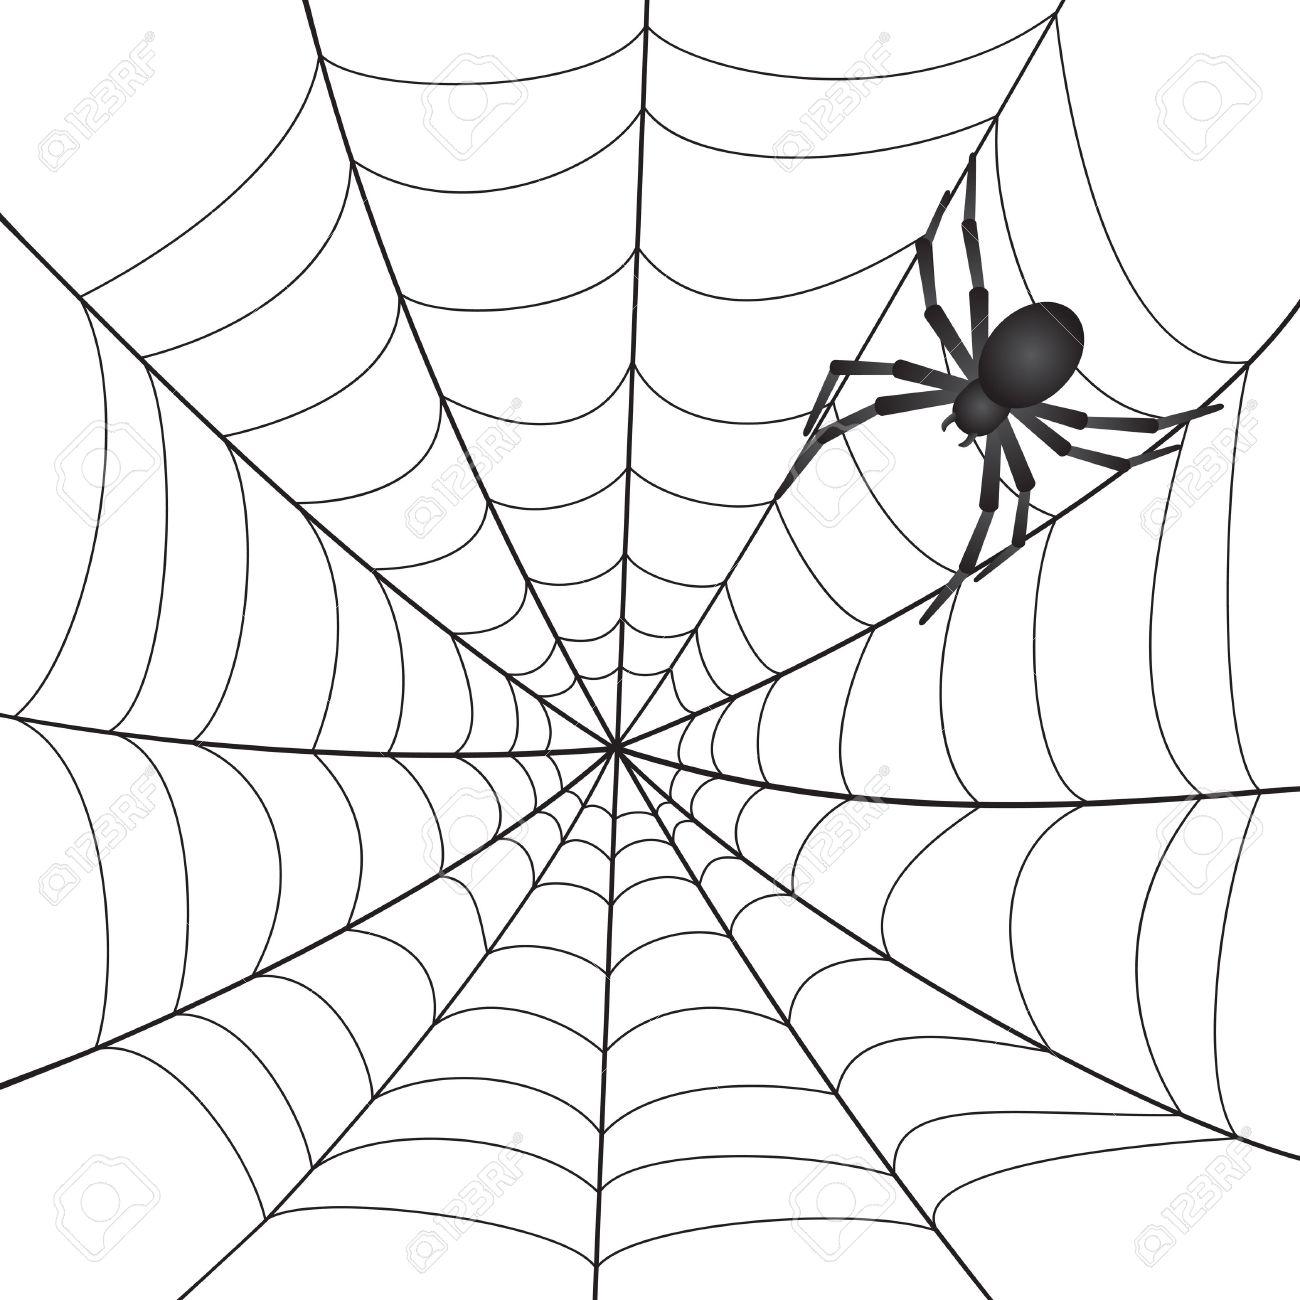 Clip art spider web clipart 2